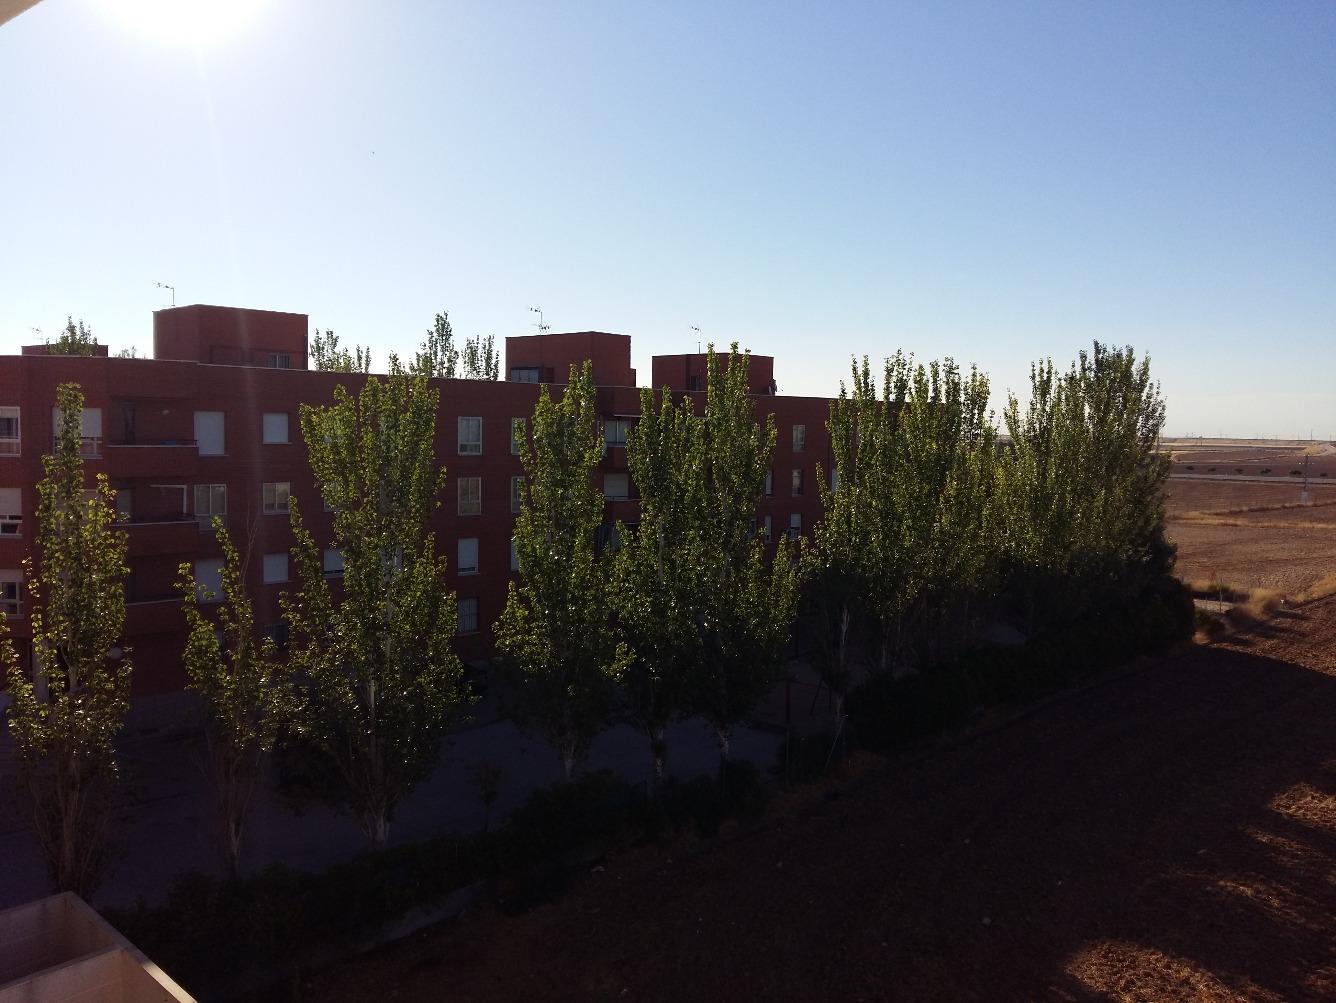 Pisos a estrenar en Ocaña - Residencial José Peña